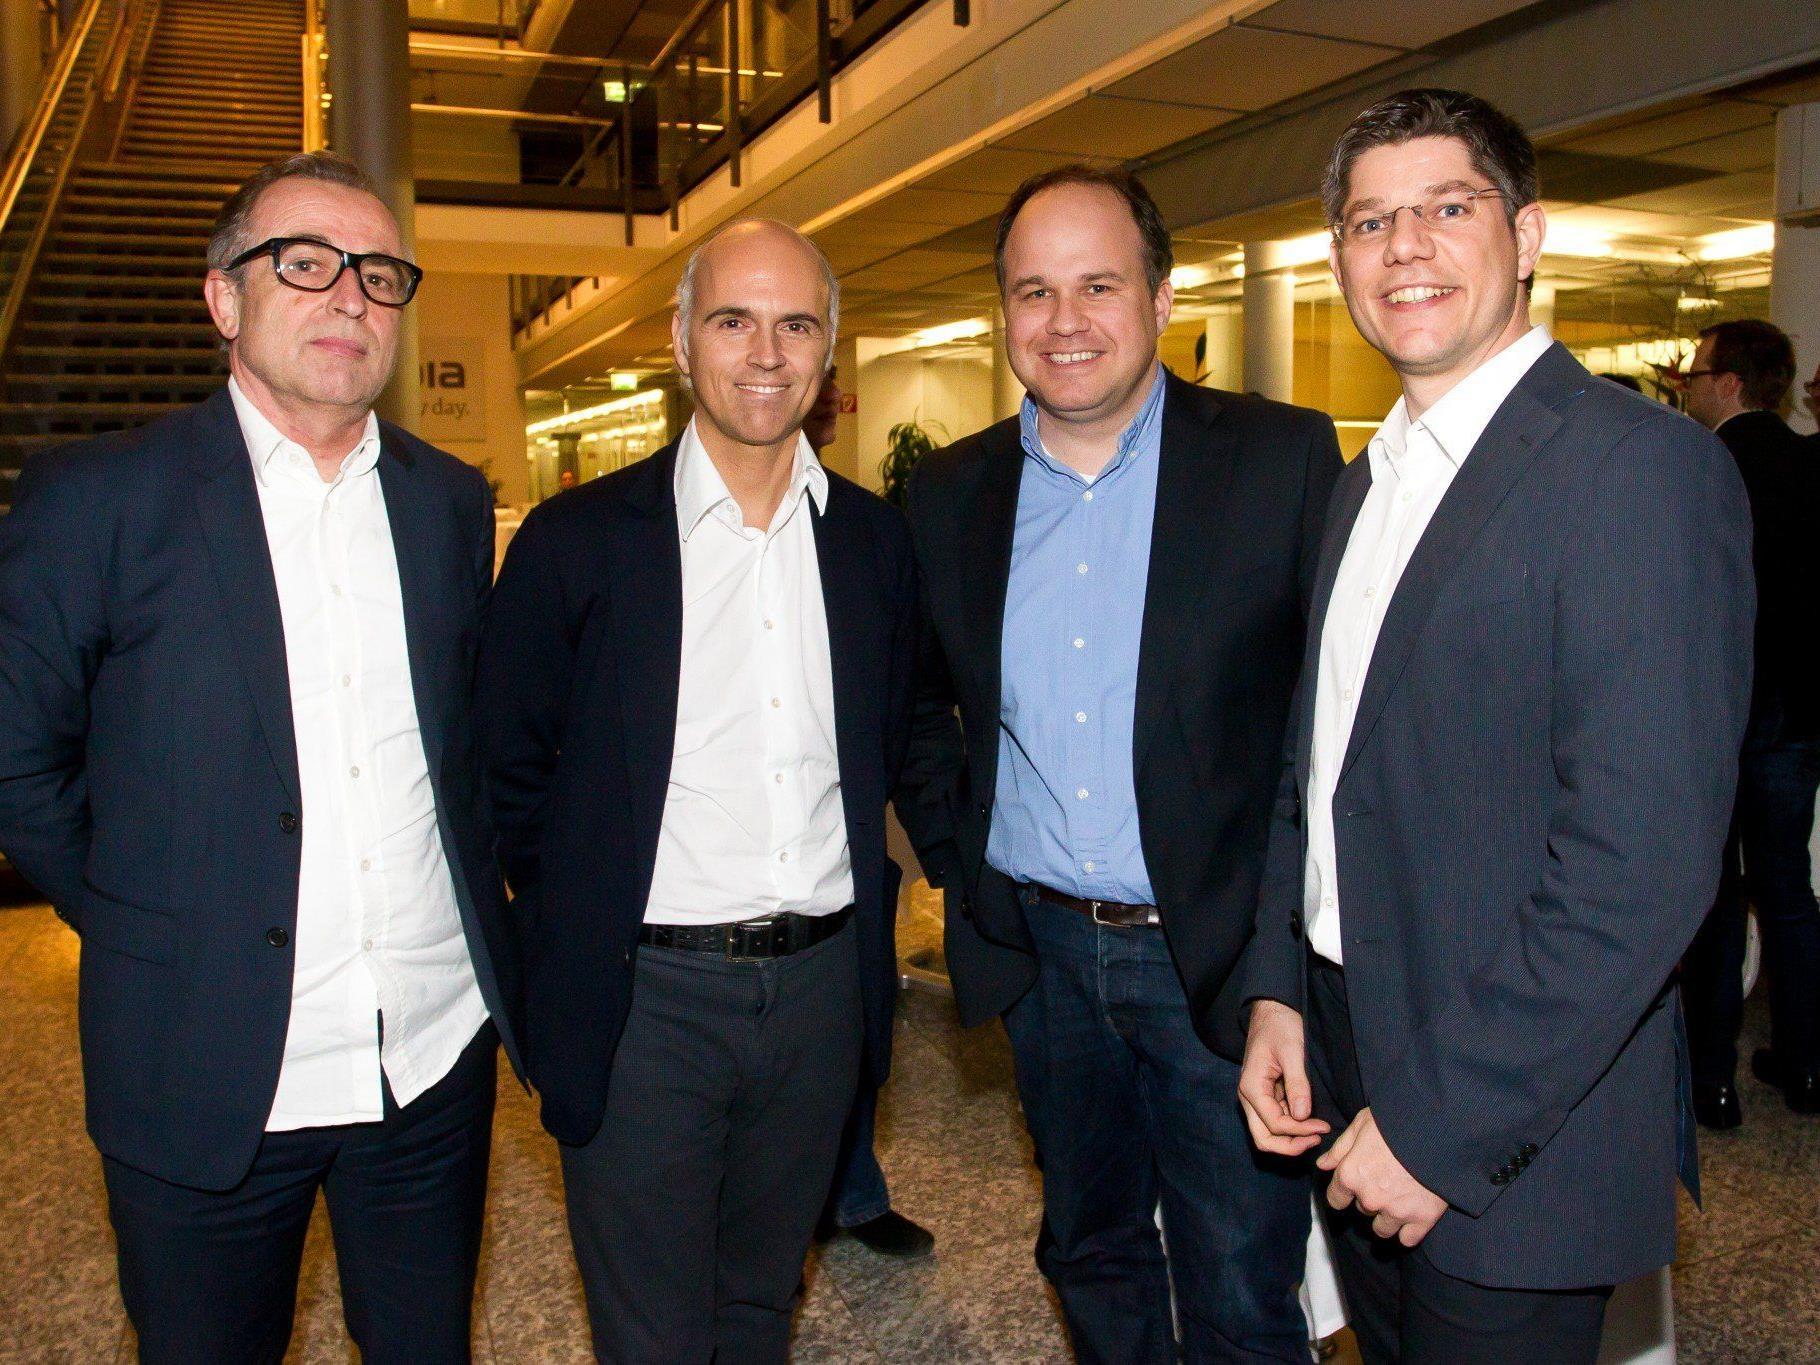 Gerard Hann (VN Key Account), Rudi Kobza (Lowe GGK), Gerold Riedmann (Russmedia) und AdWin-Organisator Simon Ender (v. l.).